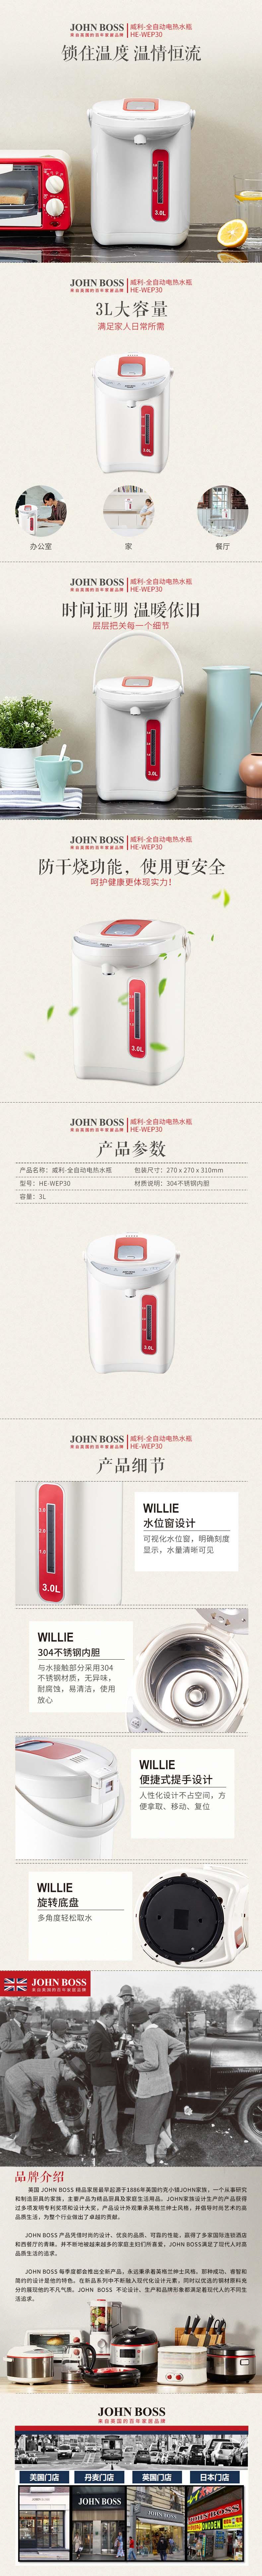 BOSS HE-WEP30全自动电热水瓶详情页20181212.jpg